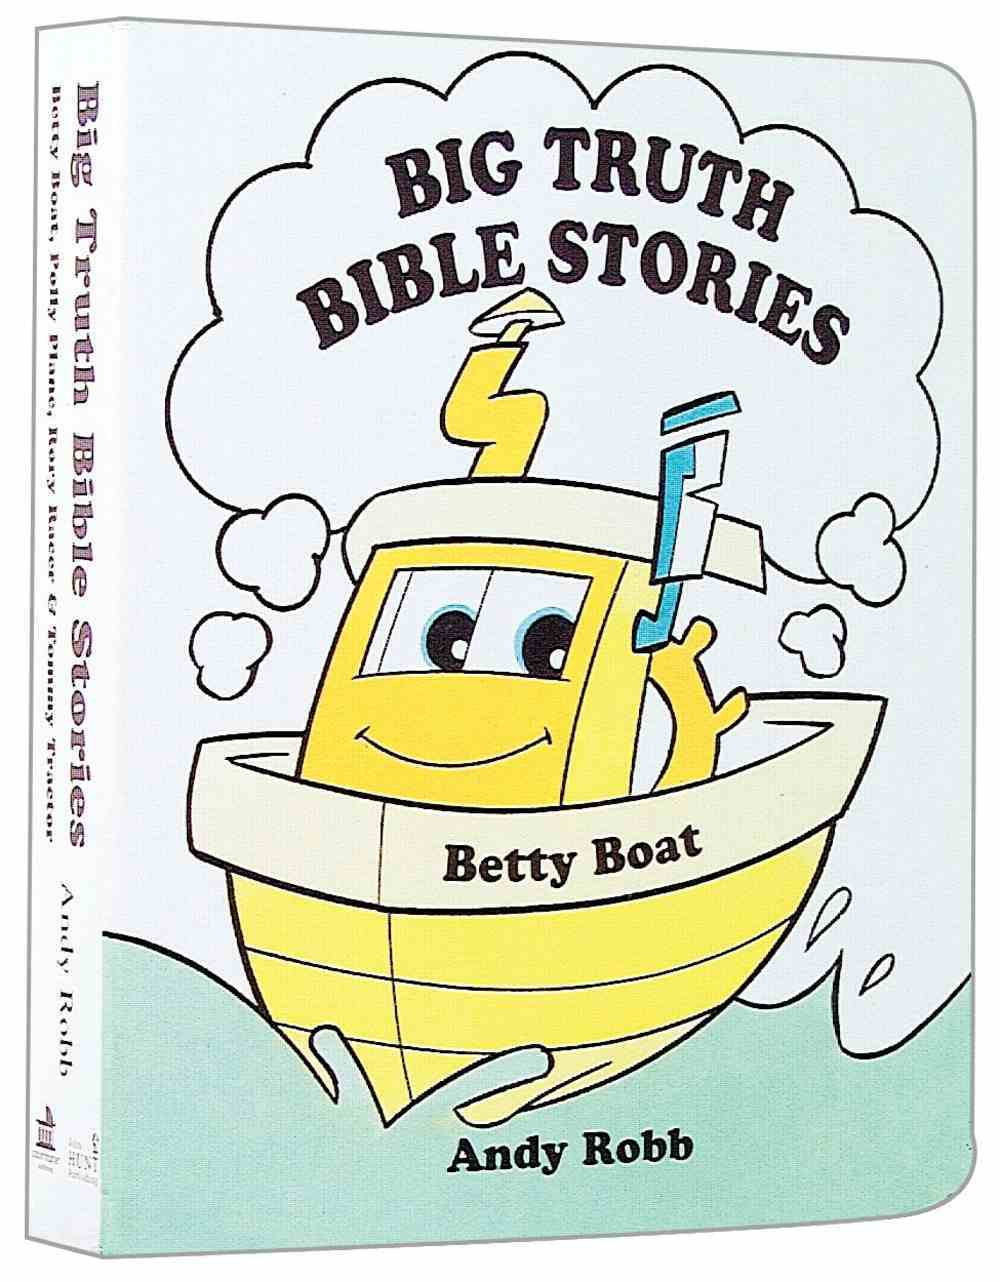 Big Truth Stories Hardback